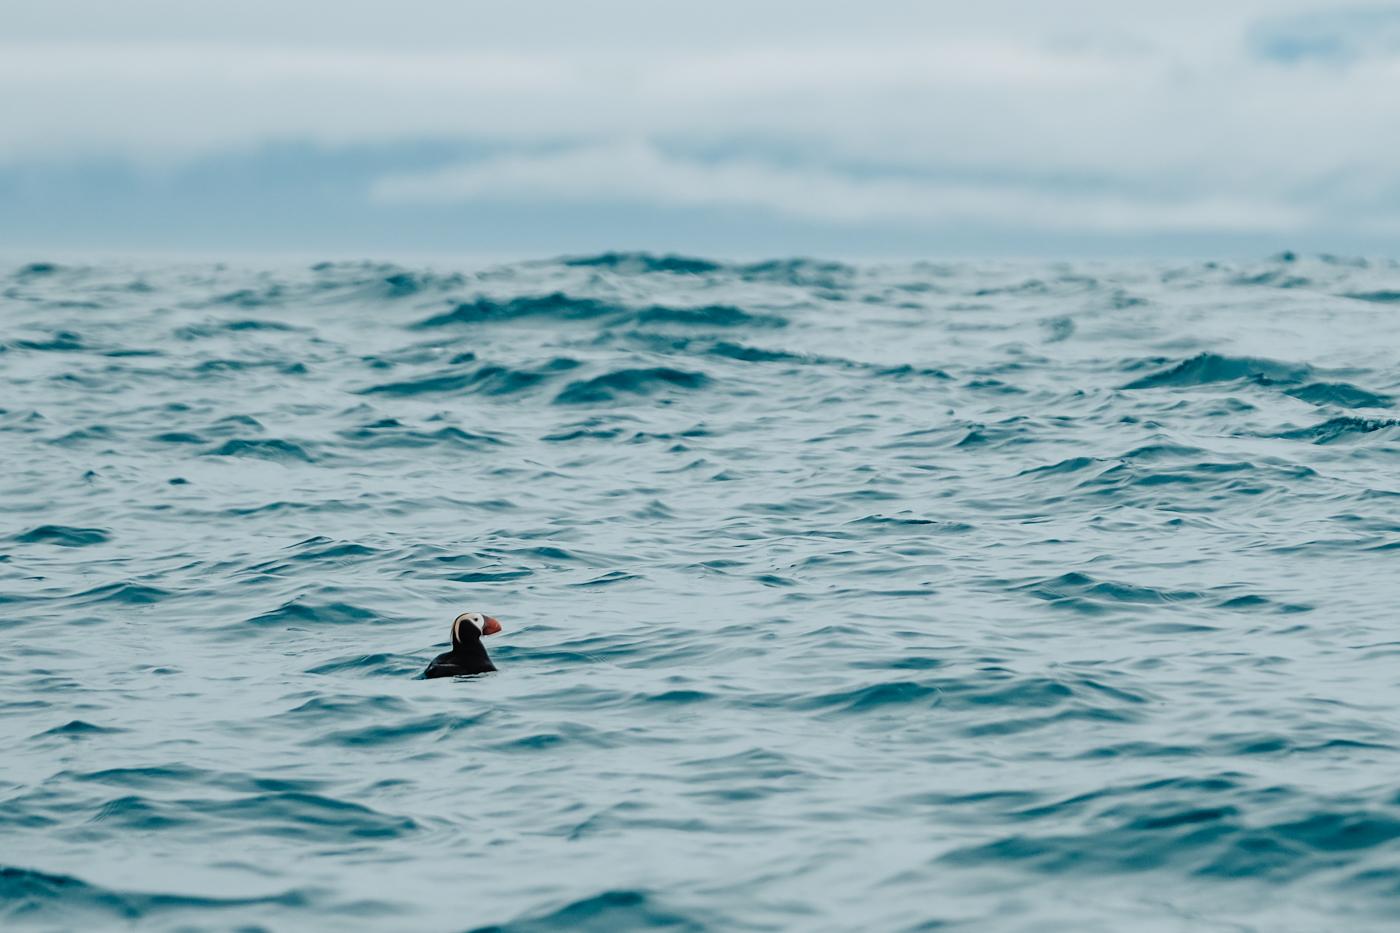 puffin-water-alaska-ocean.jpg